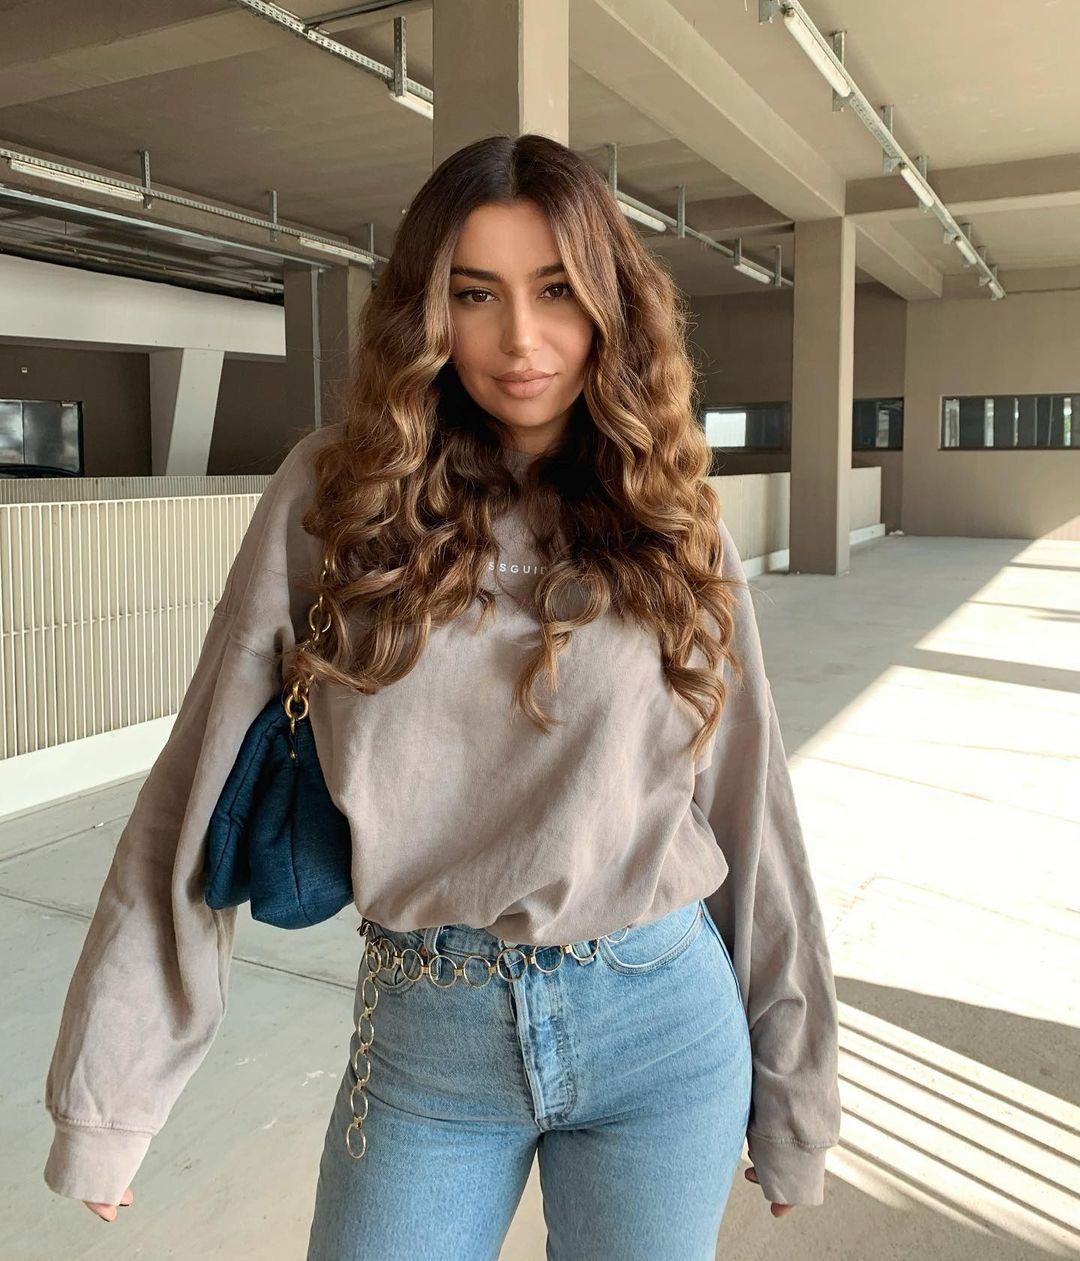 Jelena-Peric-Wallpapers-Insta-Fit-Bio-1